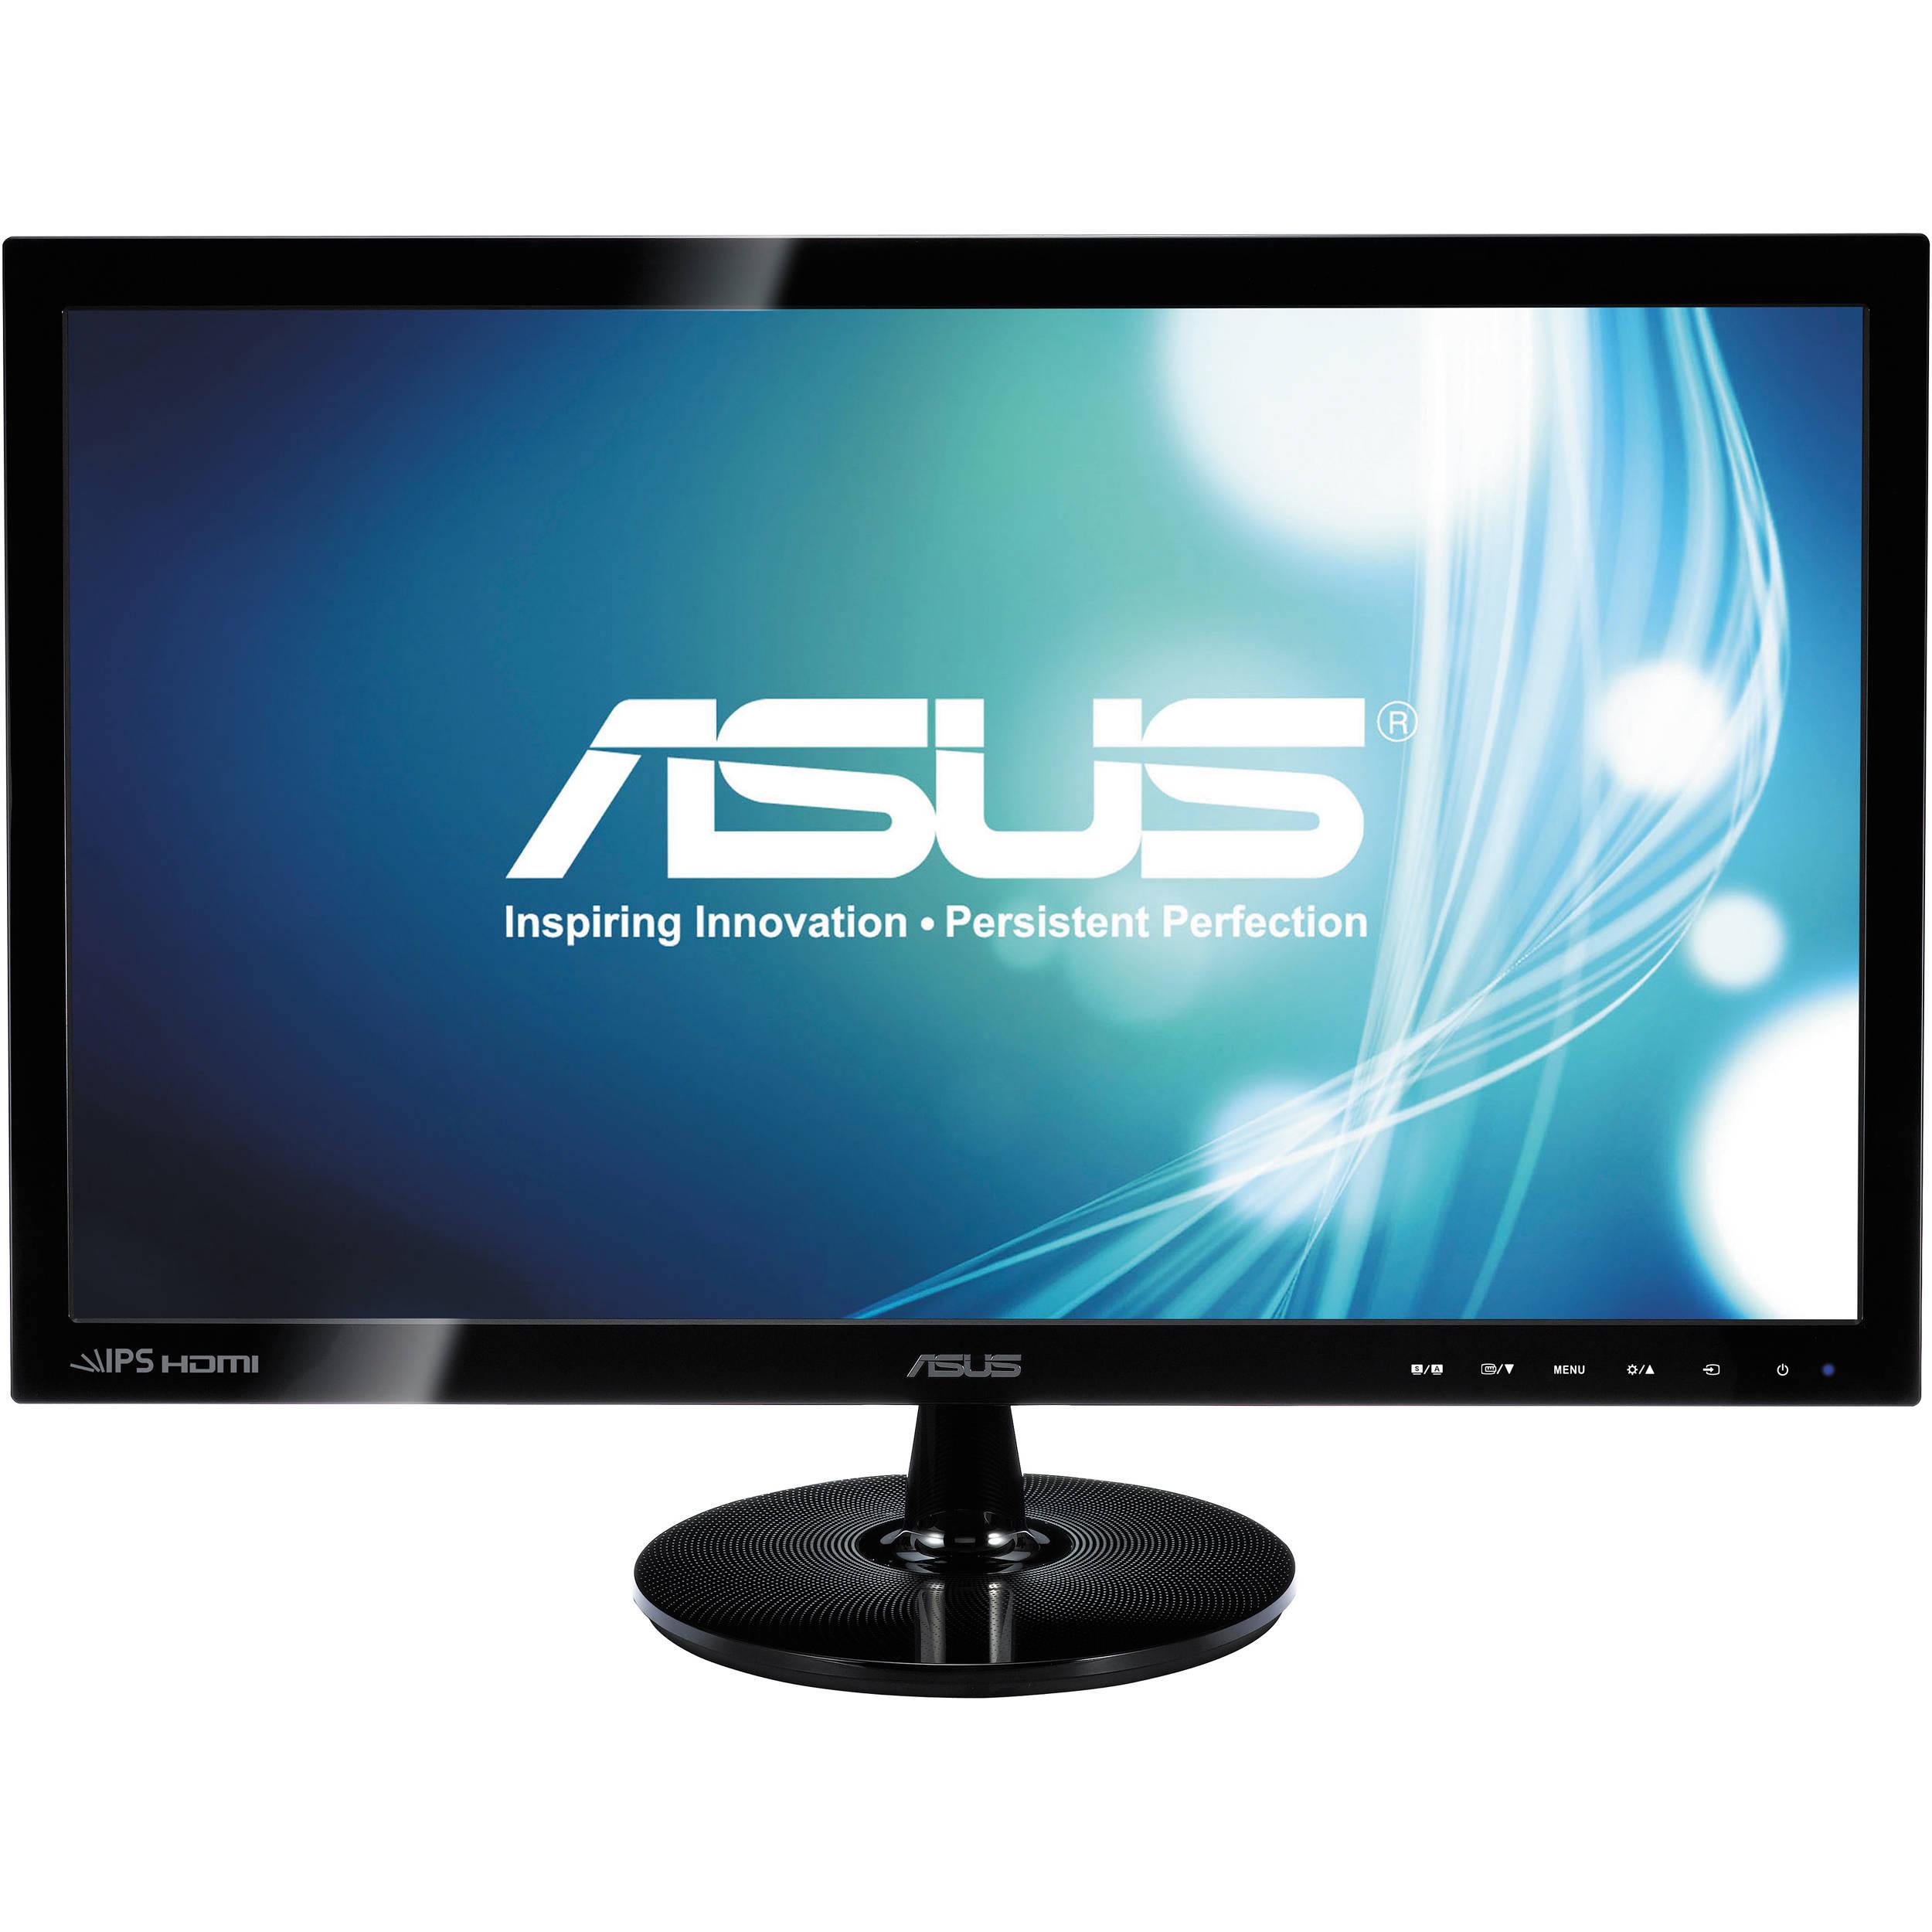 Asus Vs239h P 23 Led Backlit Widescreen Monitor Click Image For Larger Versionnameimg1634jpgviews268size638 Kbid